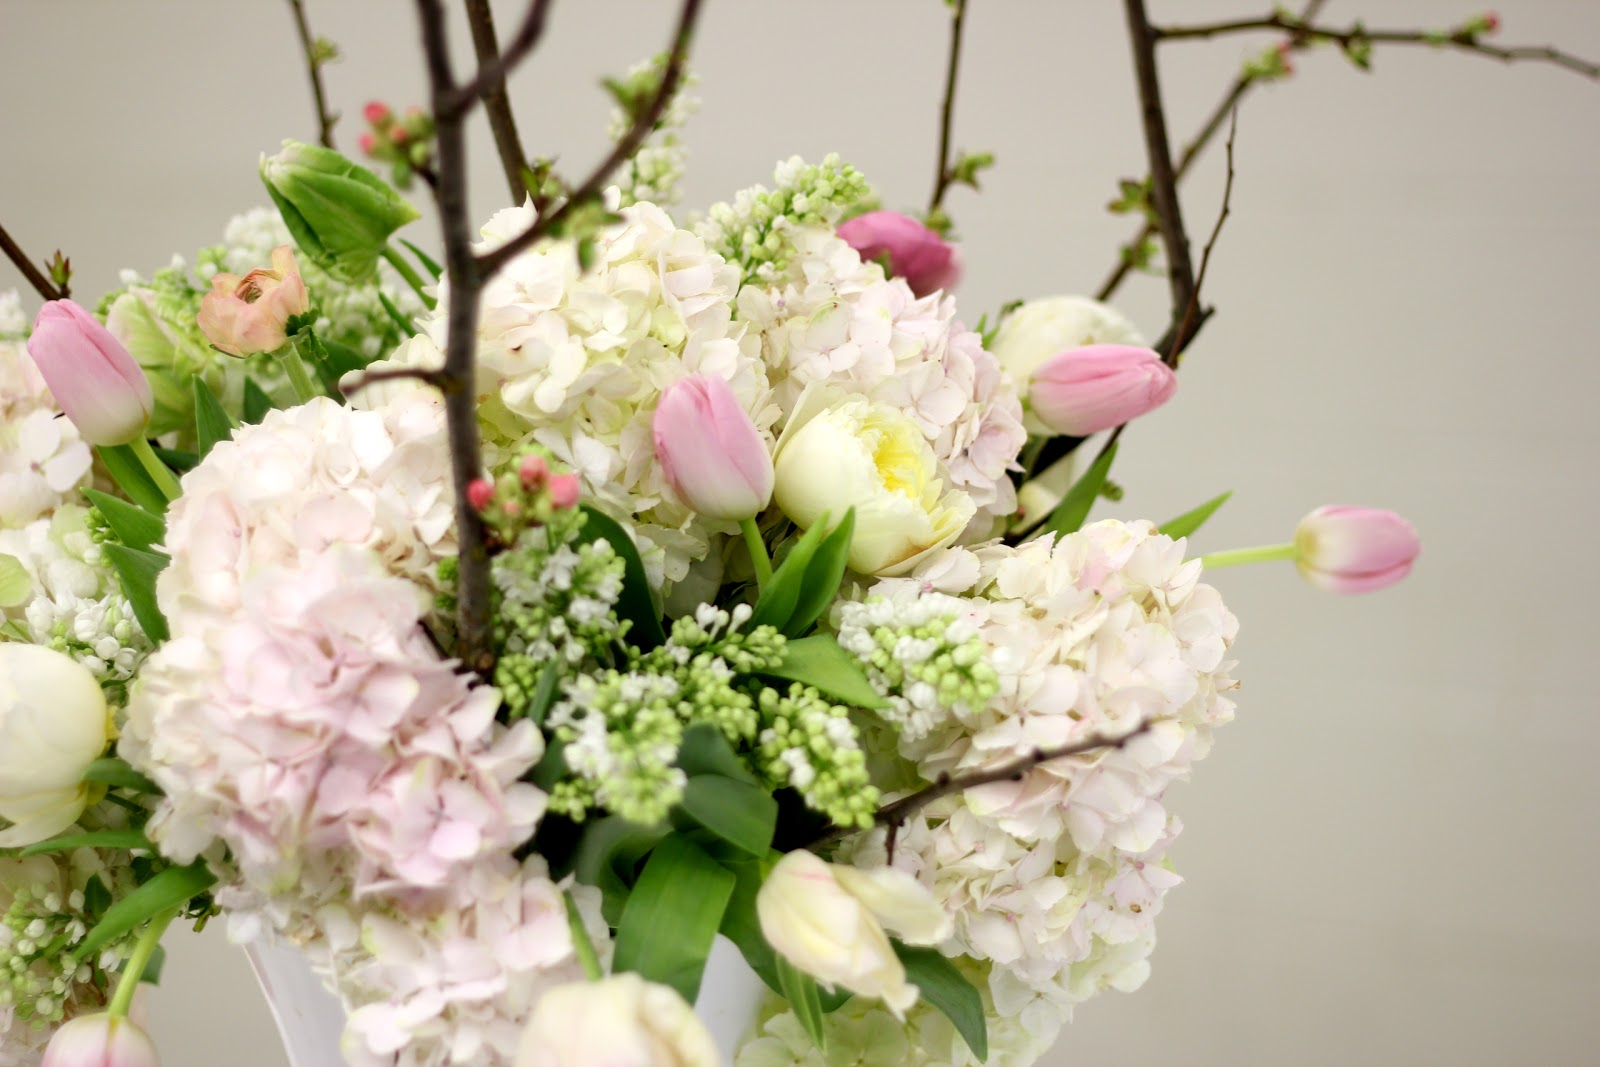 Jenny steffens hobick diy flower arrangments for emma s